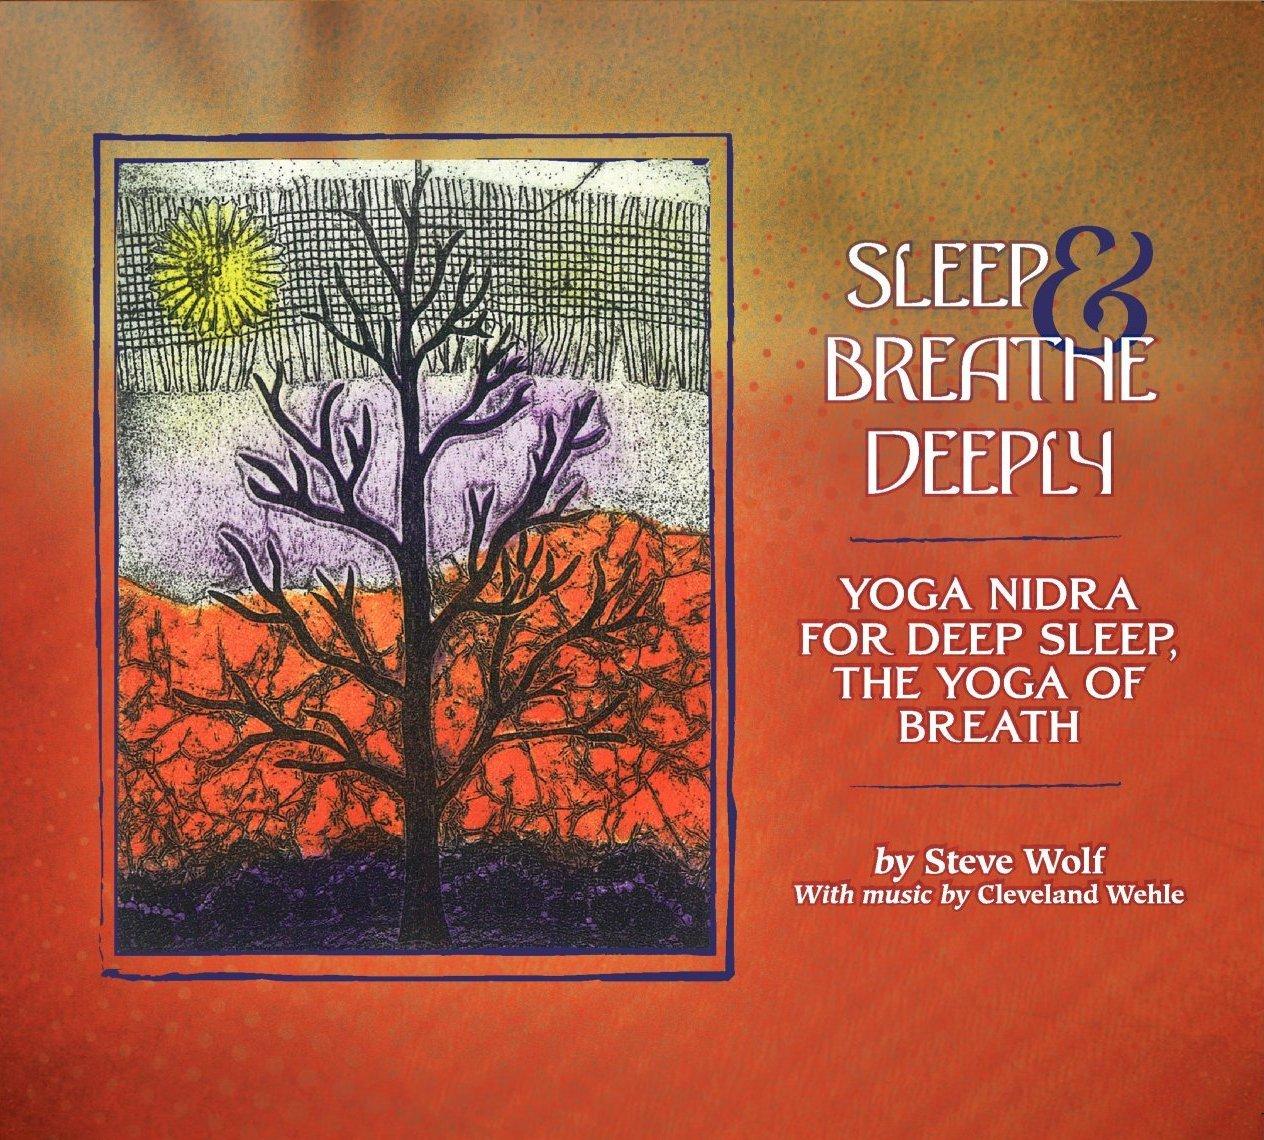 Sleep & Breathe Deeply: Yoga Nidra for Deep Sleept by Awase Publishing